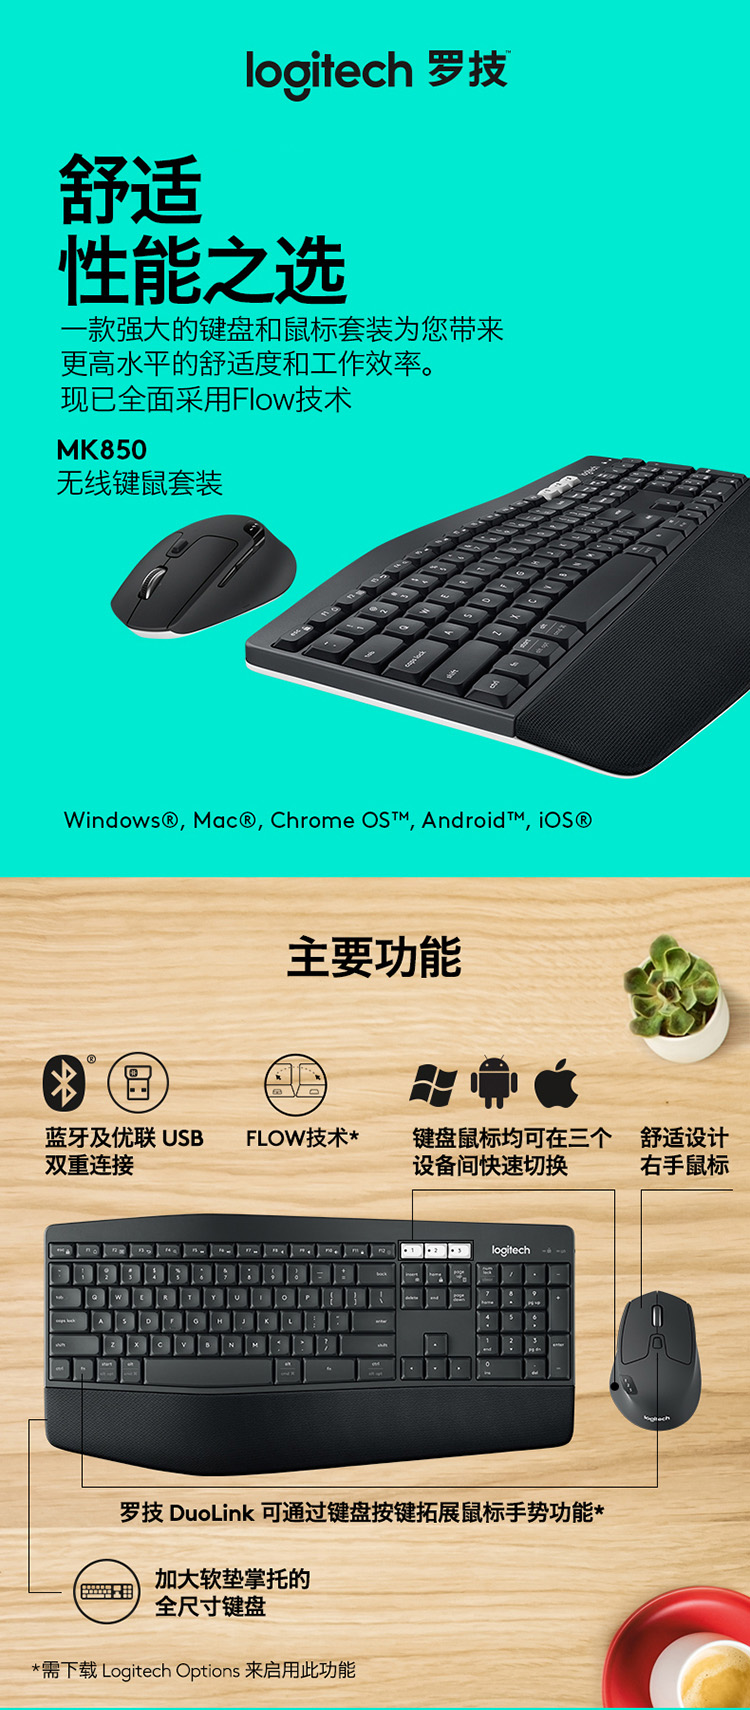 Logitech MK850 Business Office Set Wireless Keyboard Set Optimal Connection  with Palm Holder MK850 Wireless Keyboard Rat Set